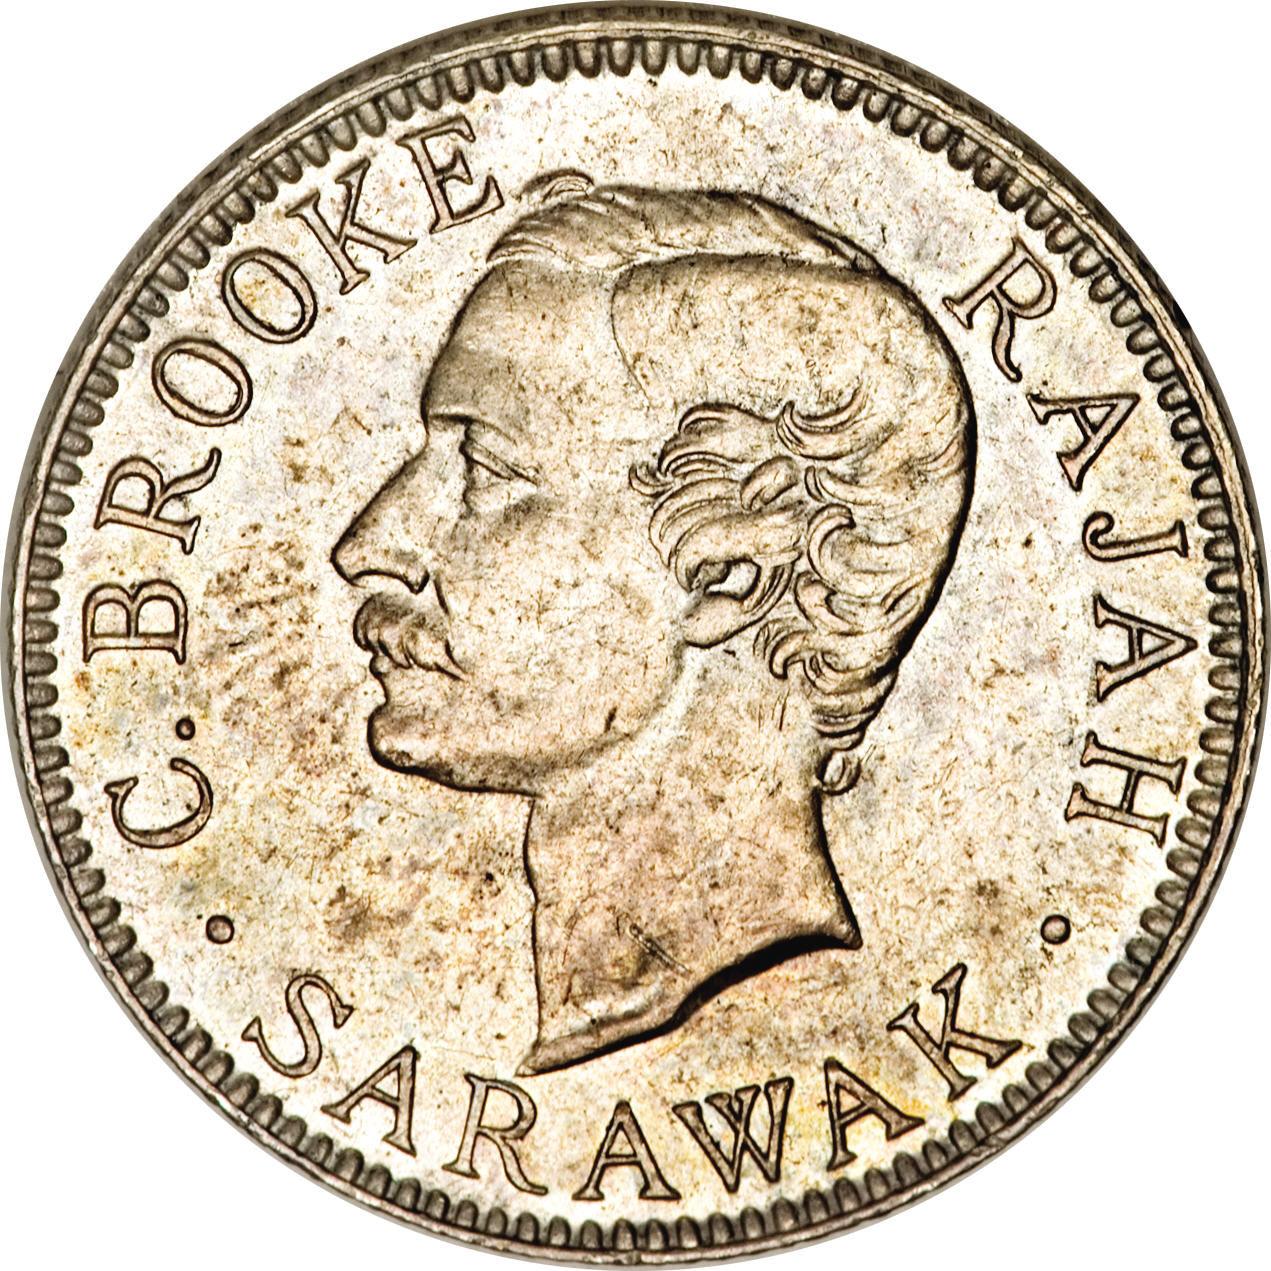 20 Cents - Charles Brooke Rajah - Sarawak - Numista